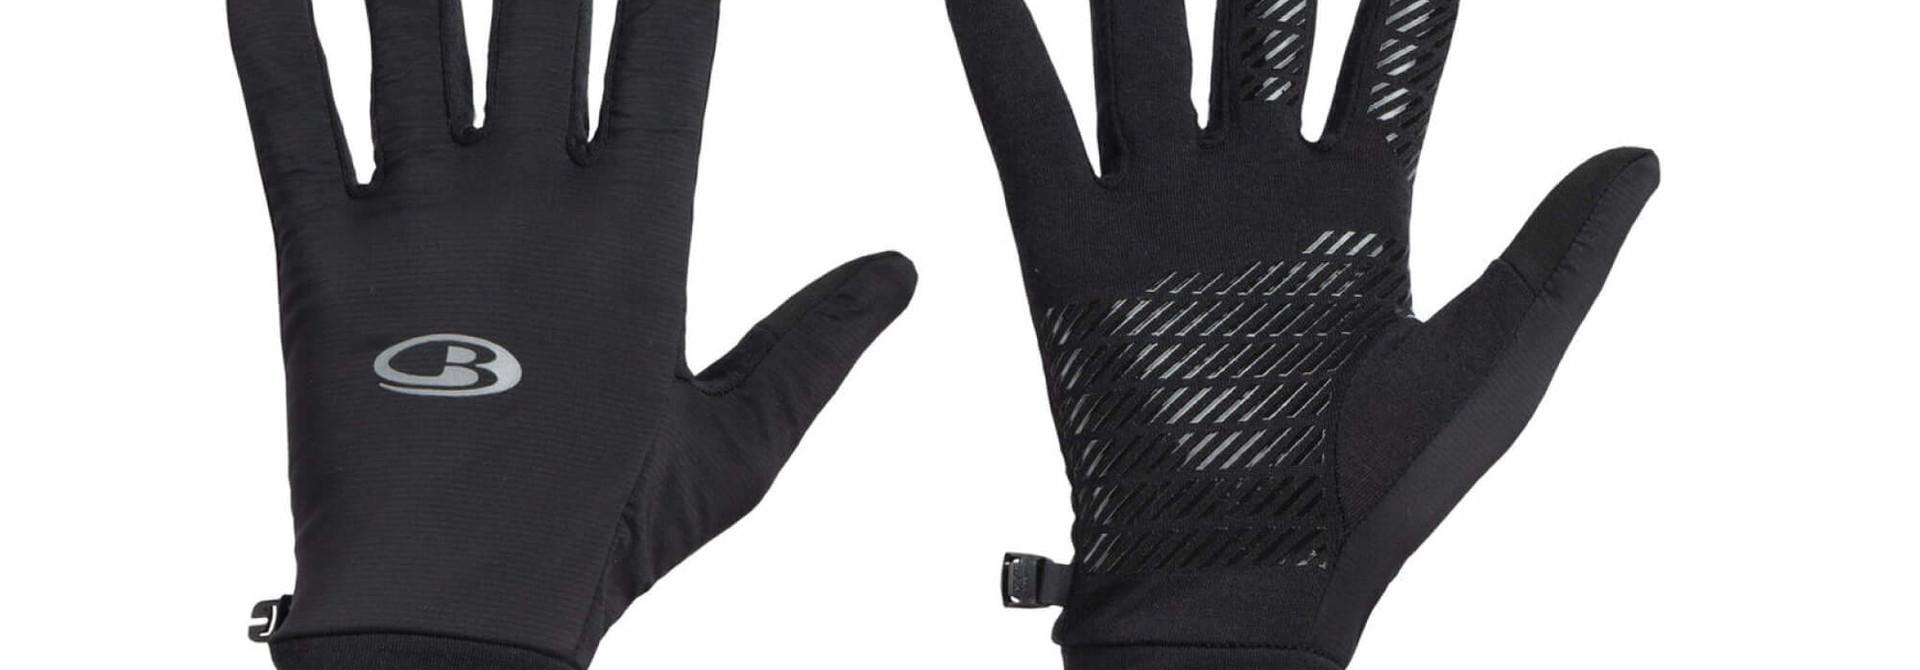 Adult Tech Trainer Hybrid Gloves Black